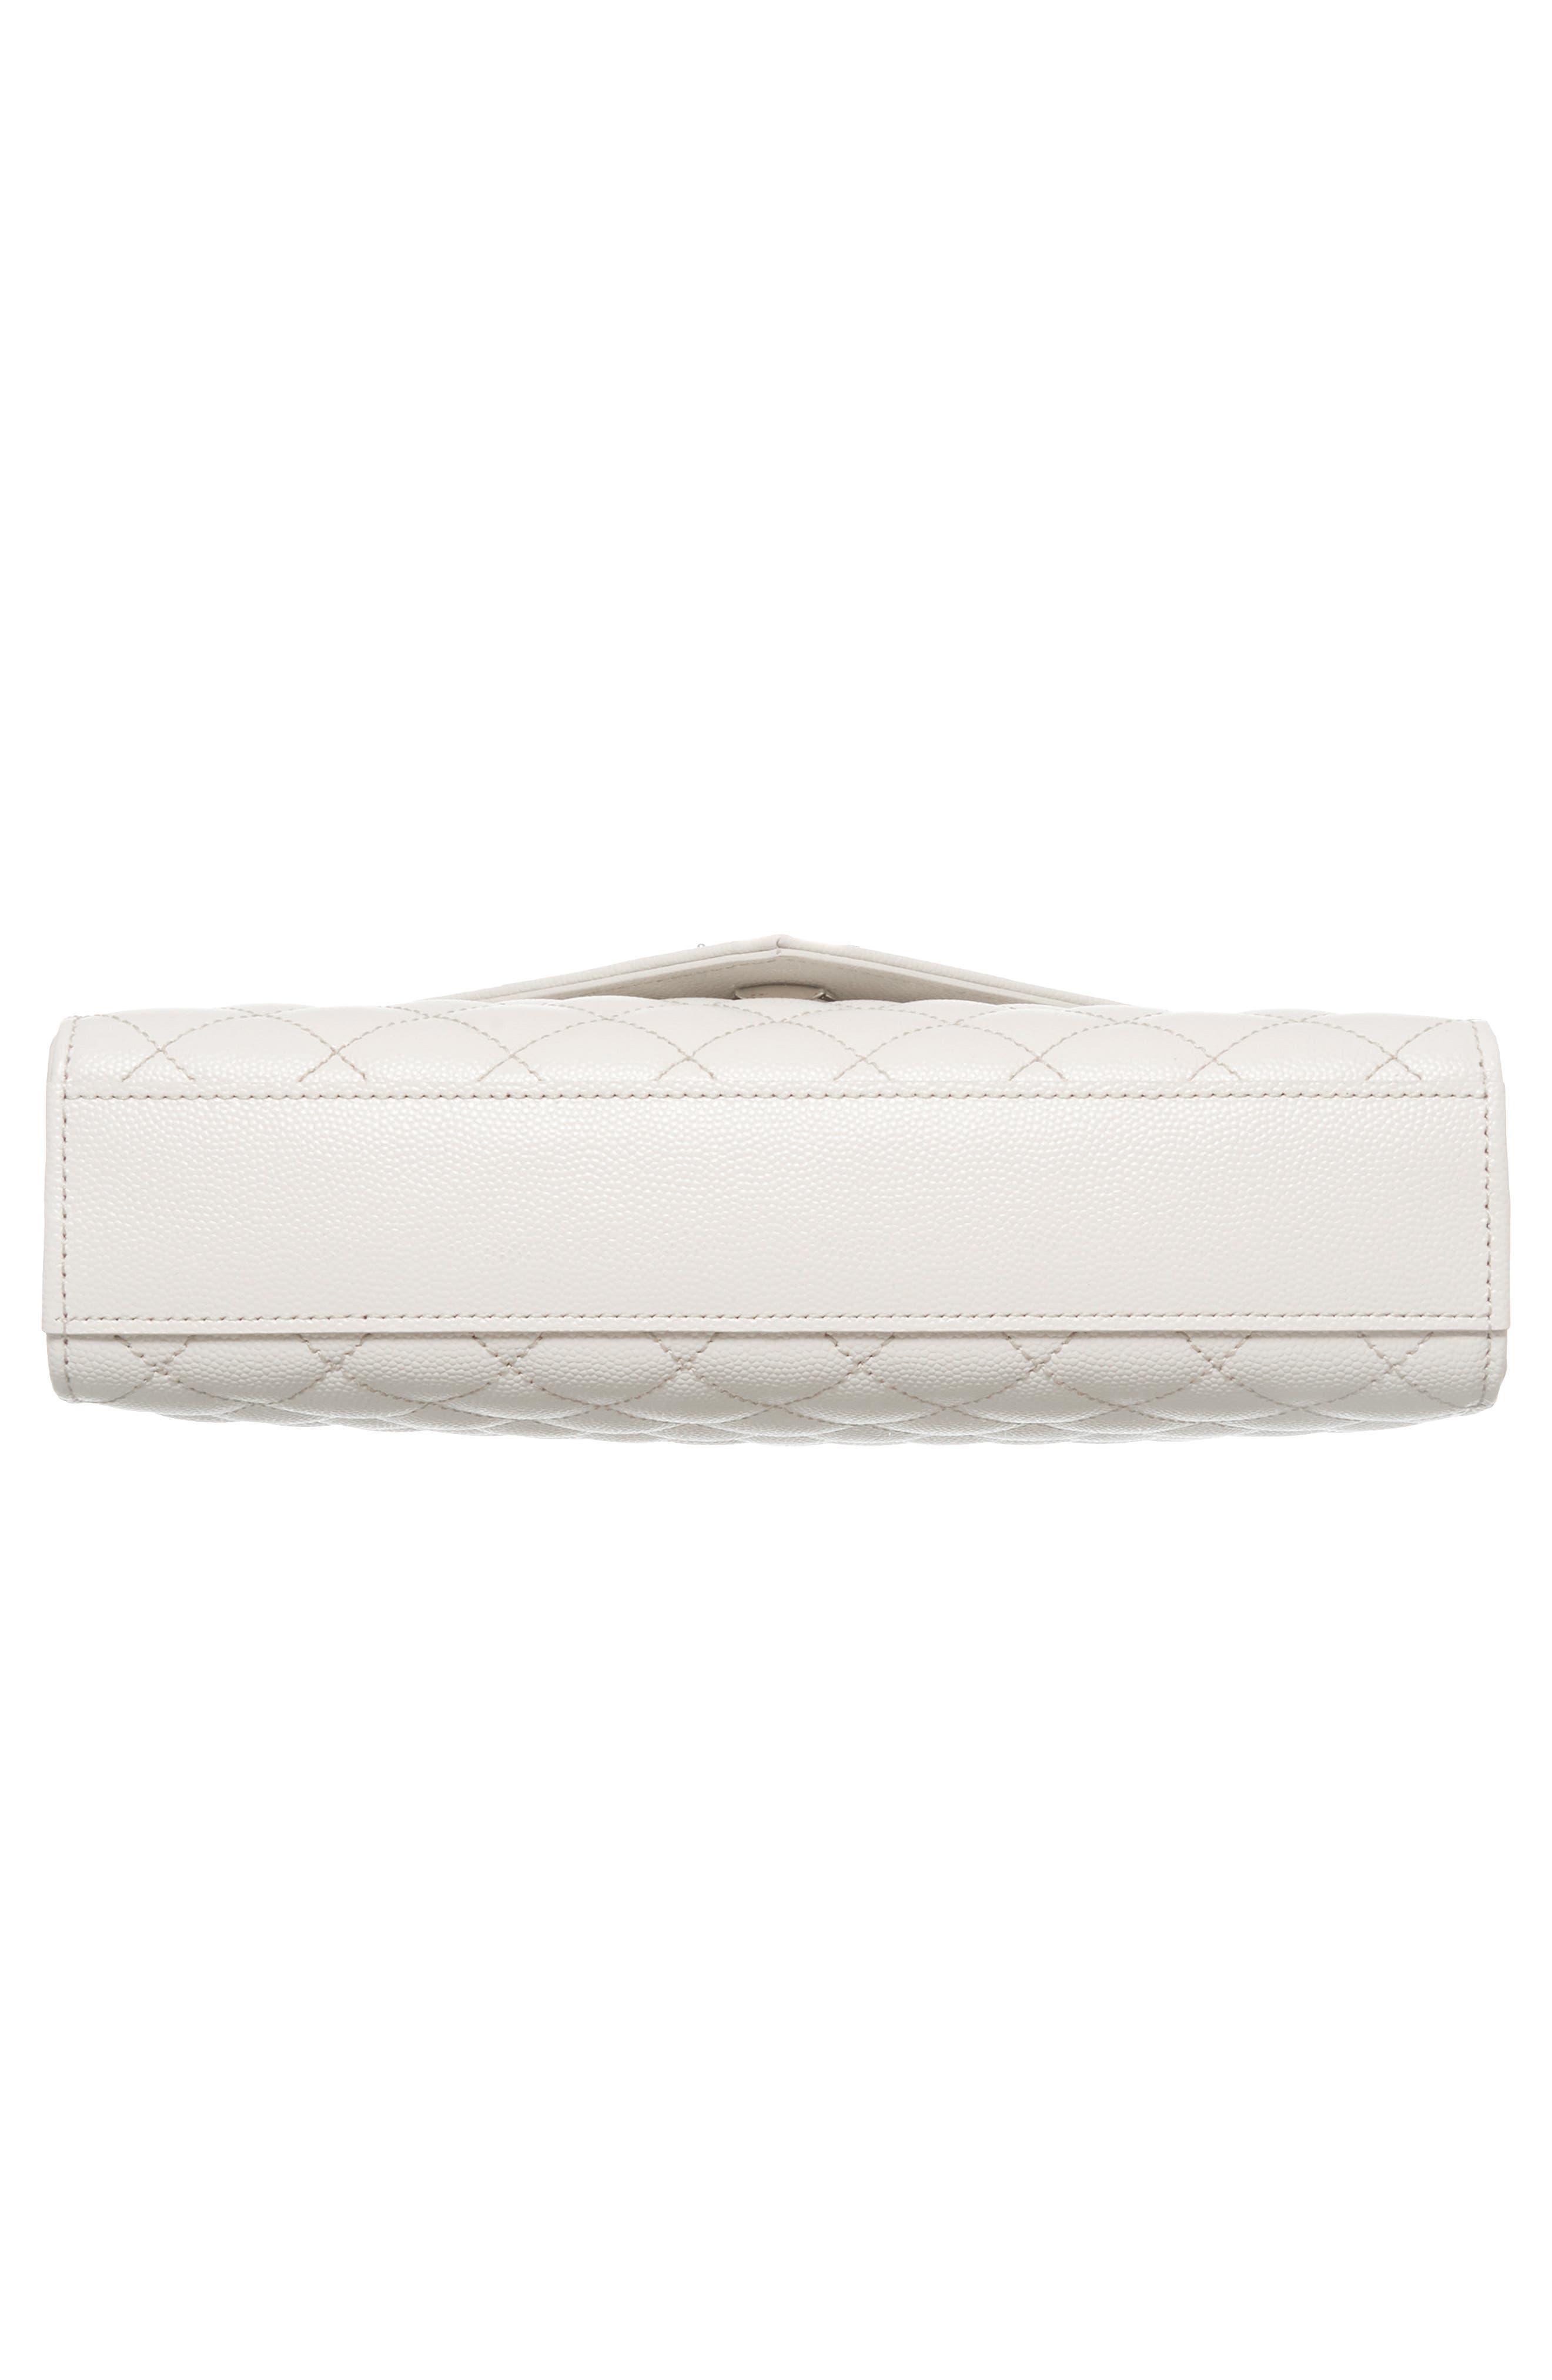 Medium Cassandra Calfskin Shoulder Bag,                             Alternate thumbnail 6, color,                             ICY WHITE/ ICY WHITE